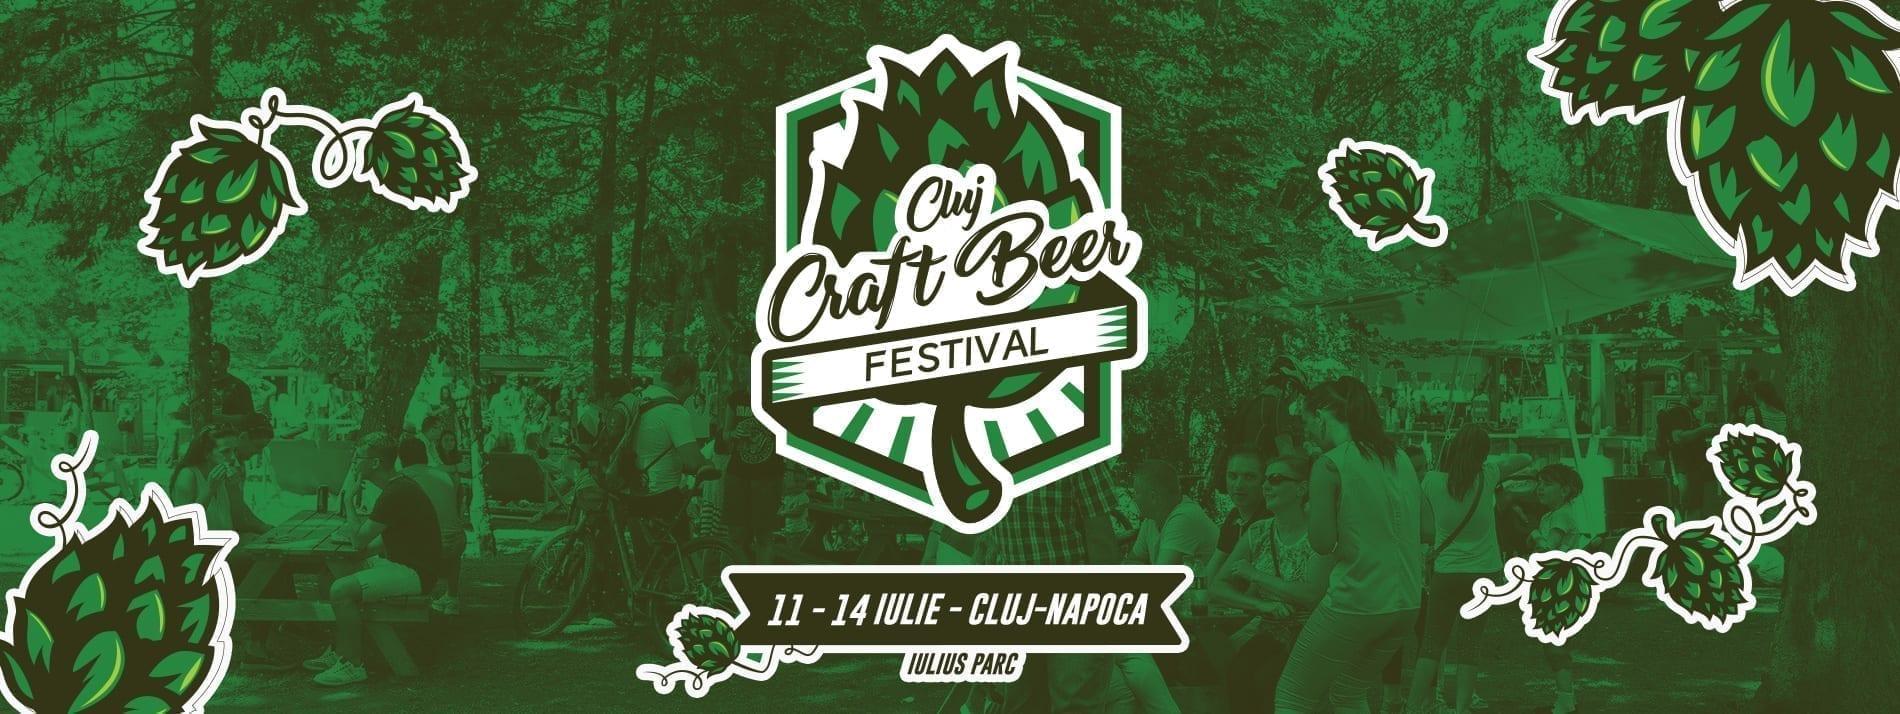 Cluj Craft Beer Festival - ediția 2019